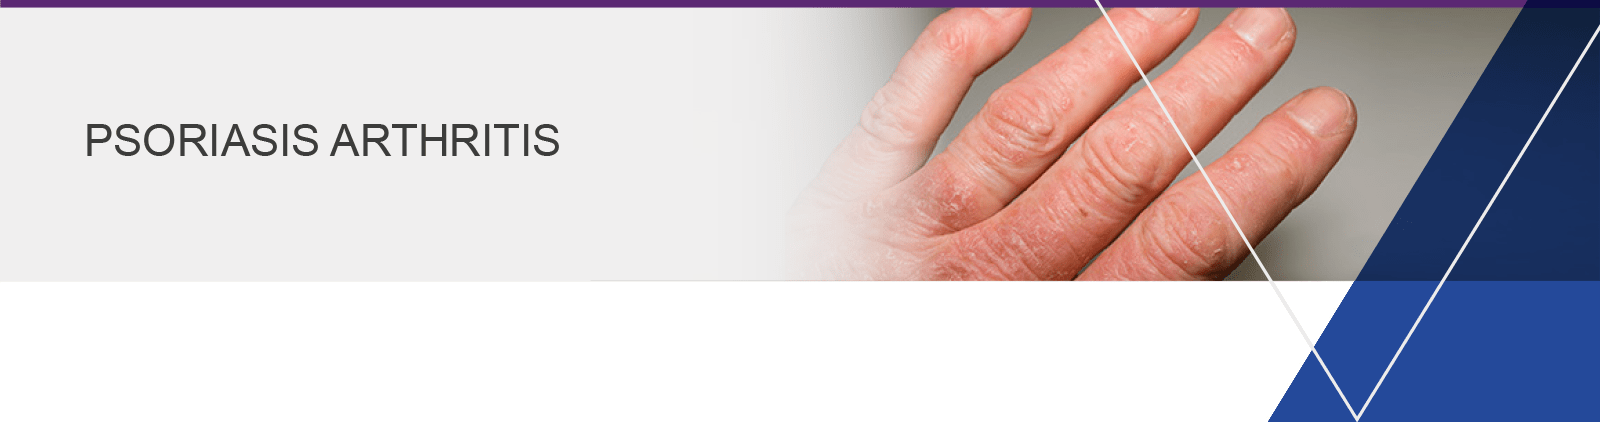 banner-psoriasis-arthritis-verstehen